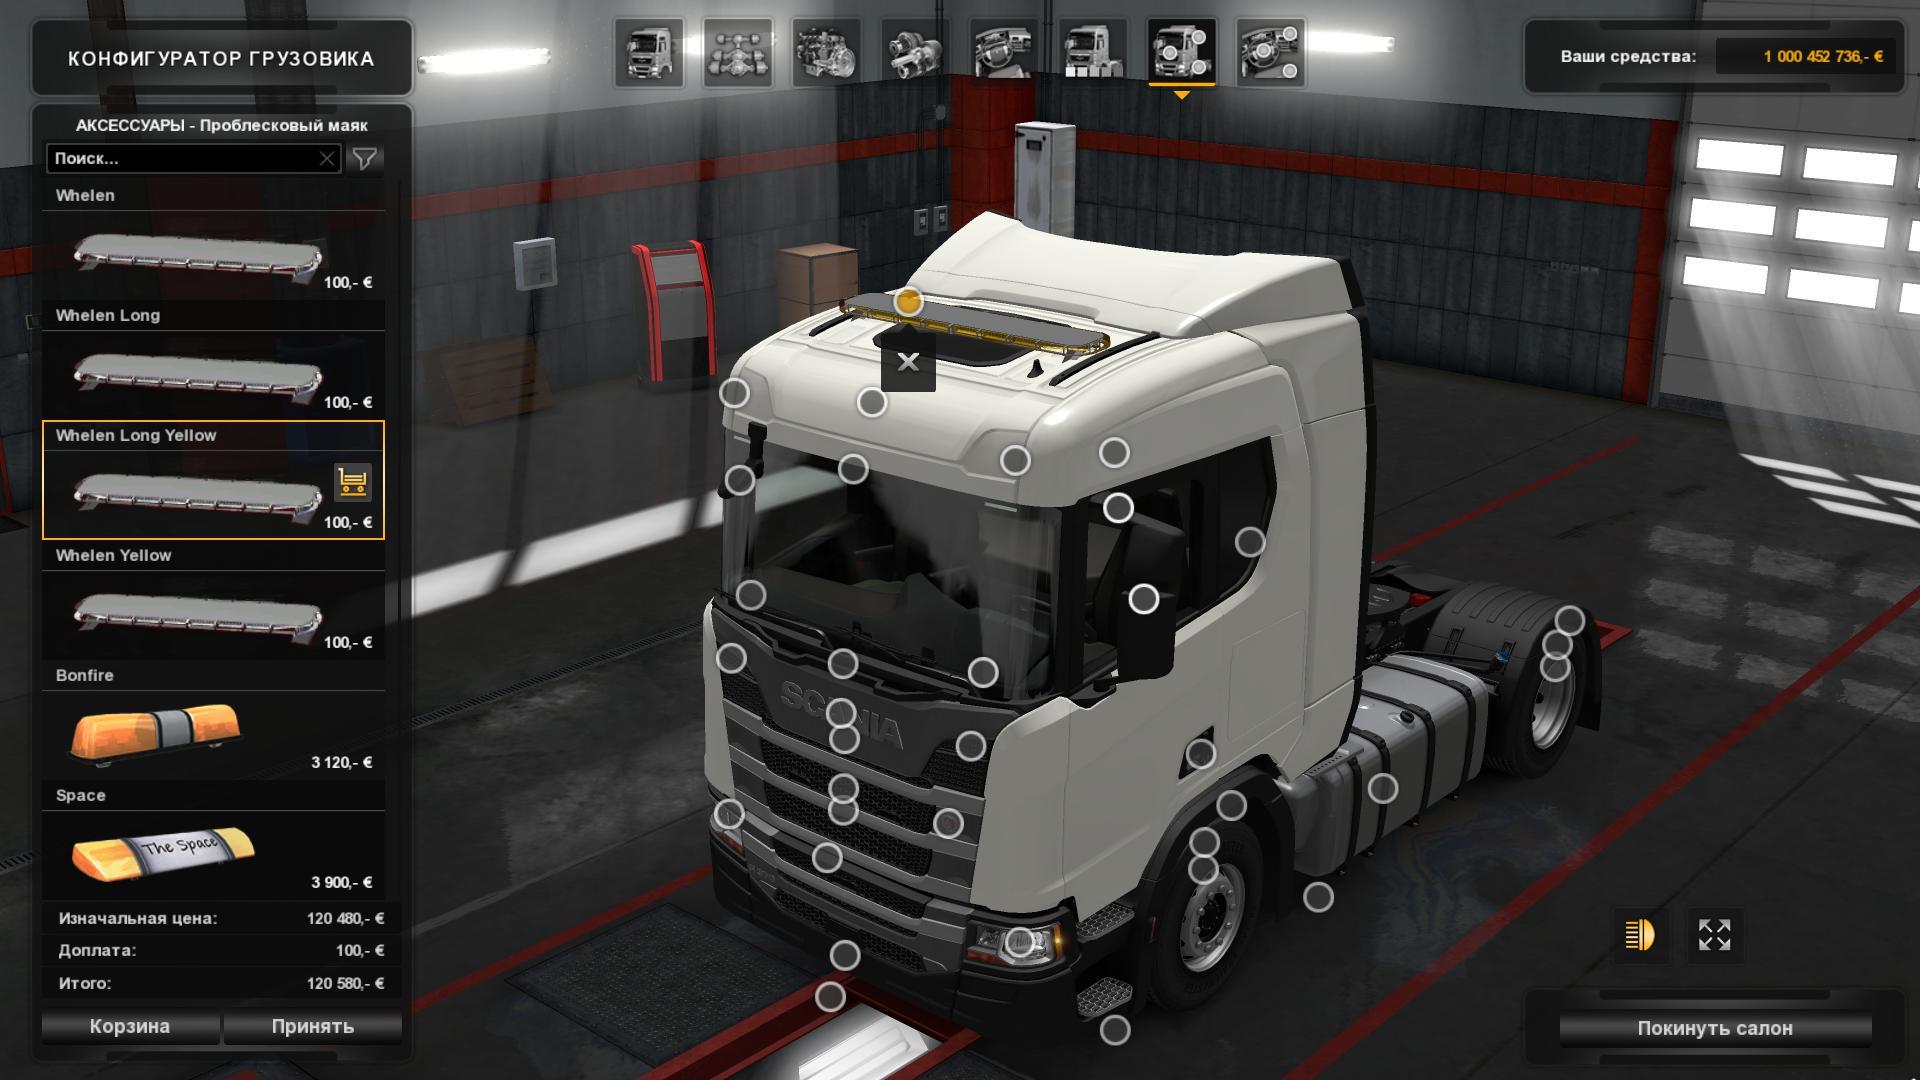 Whelen Lightbar V1 3 5 1 30 Tuning Mod Ets2 Mod